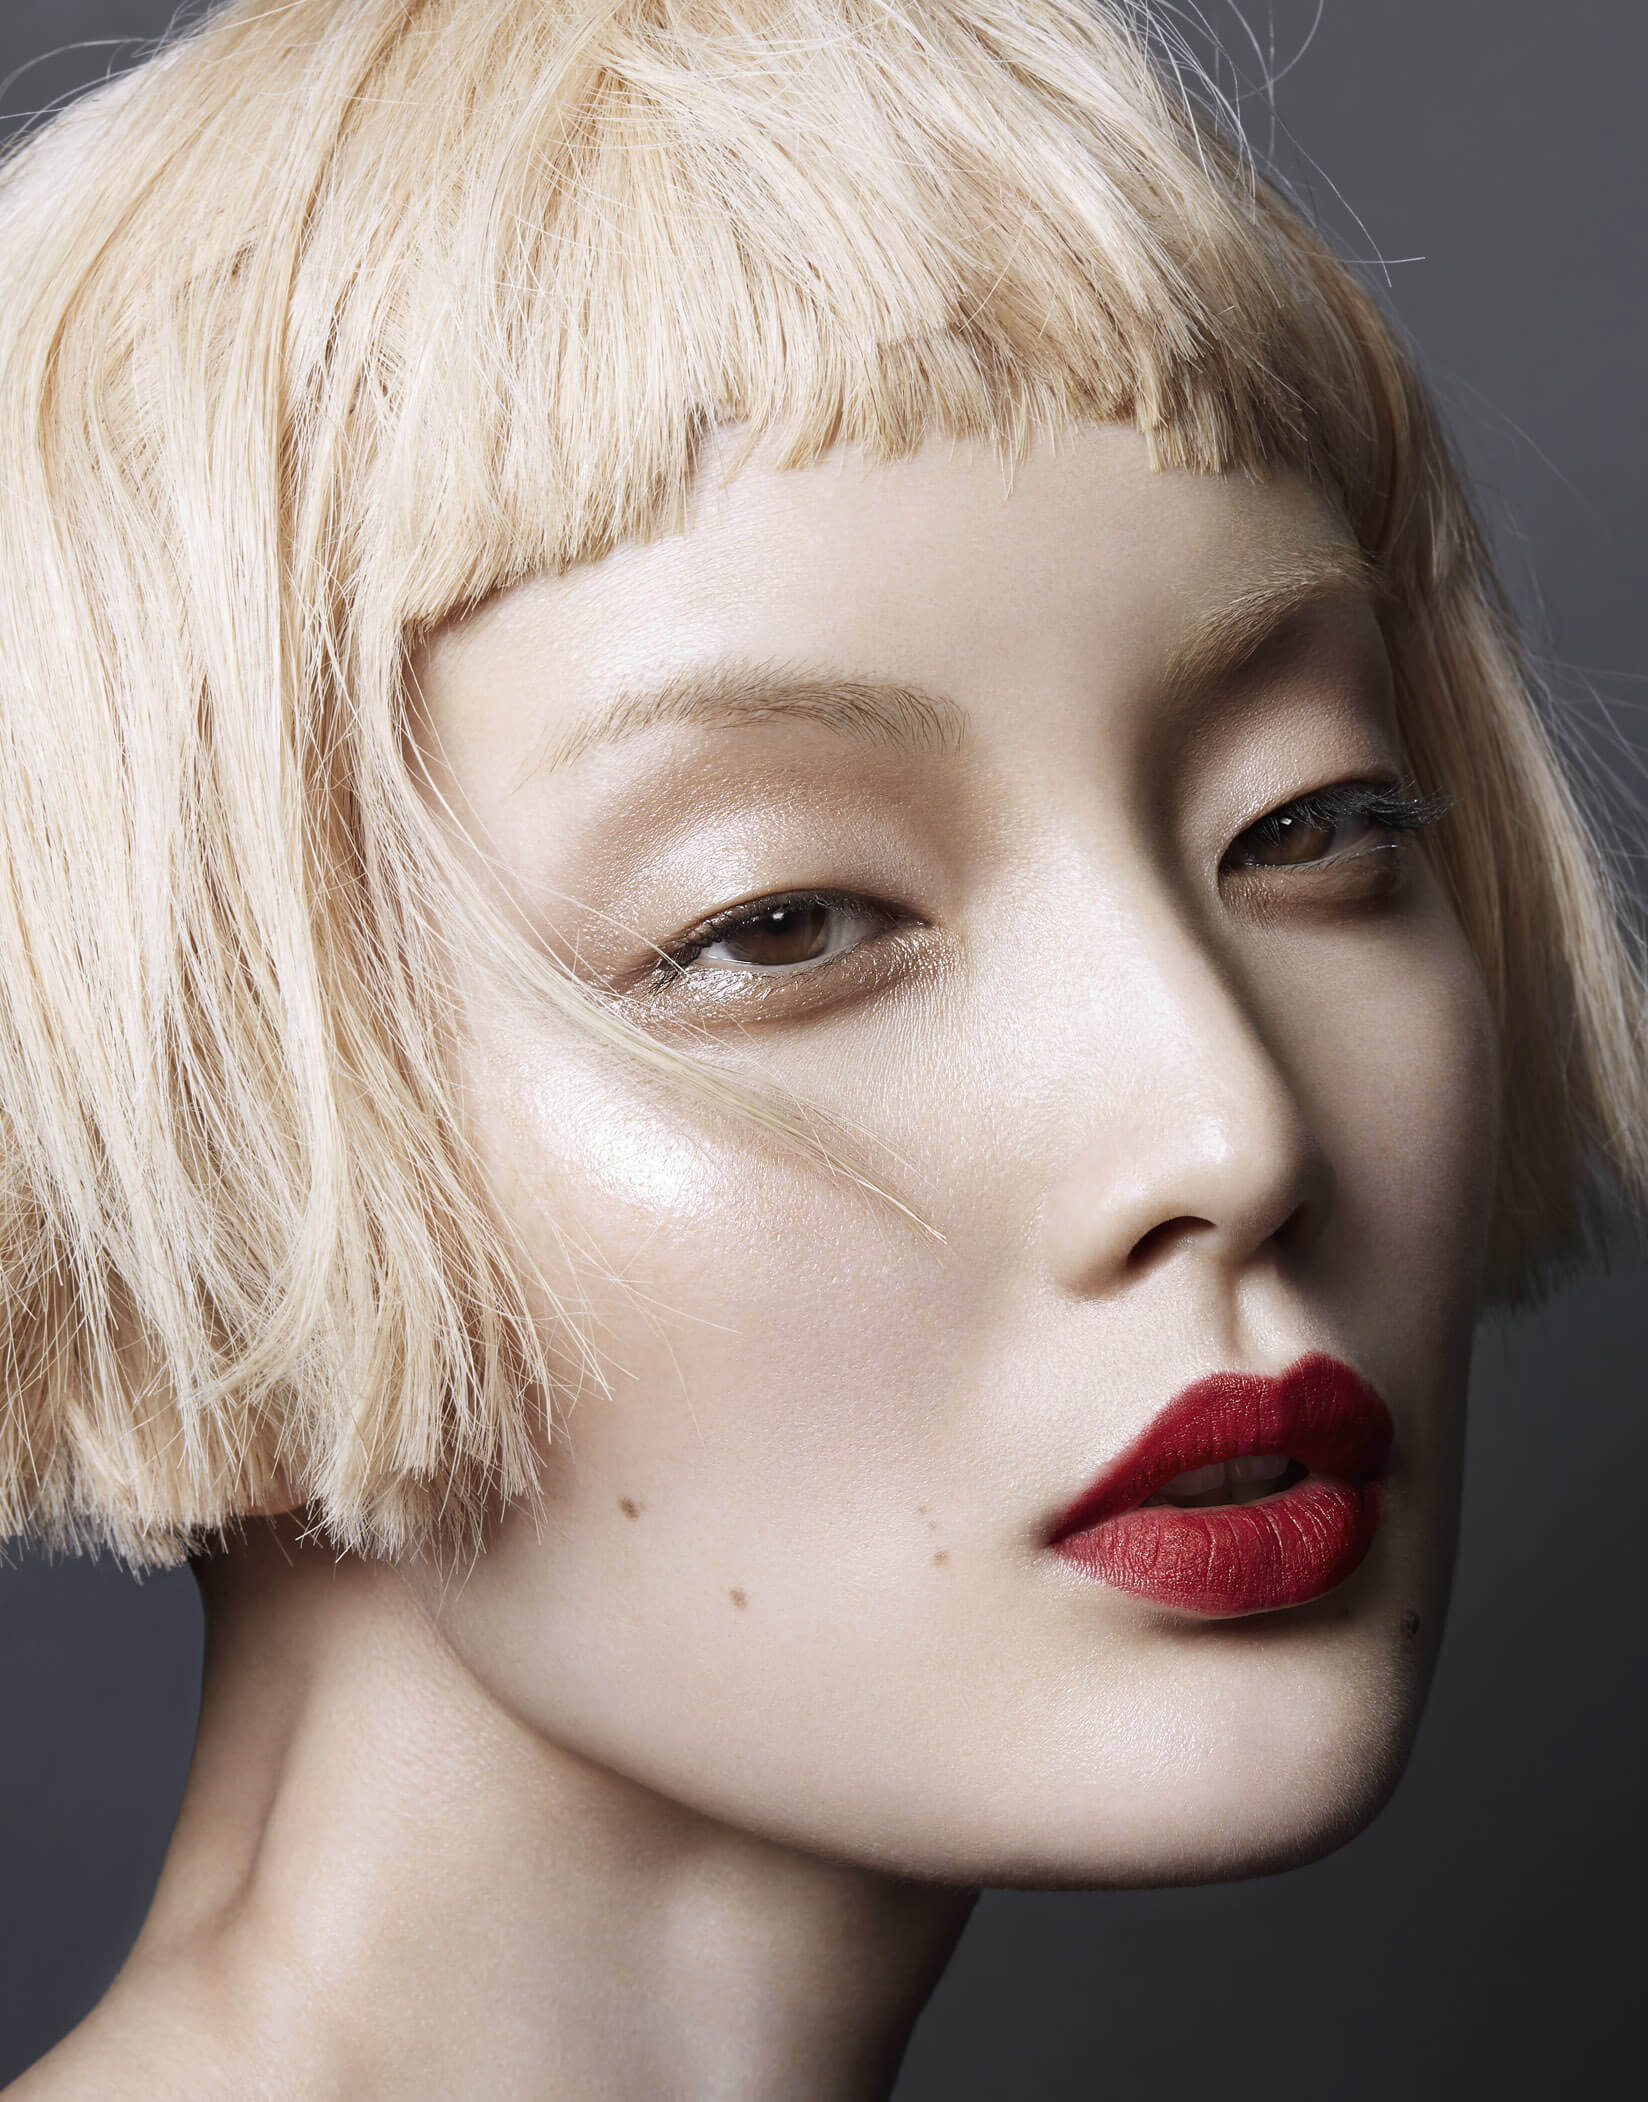 Personal Beauty Tamaki Yoshida